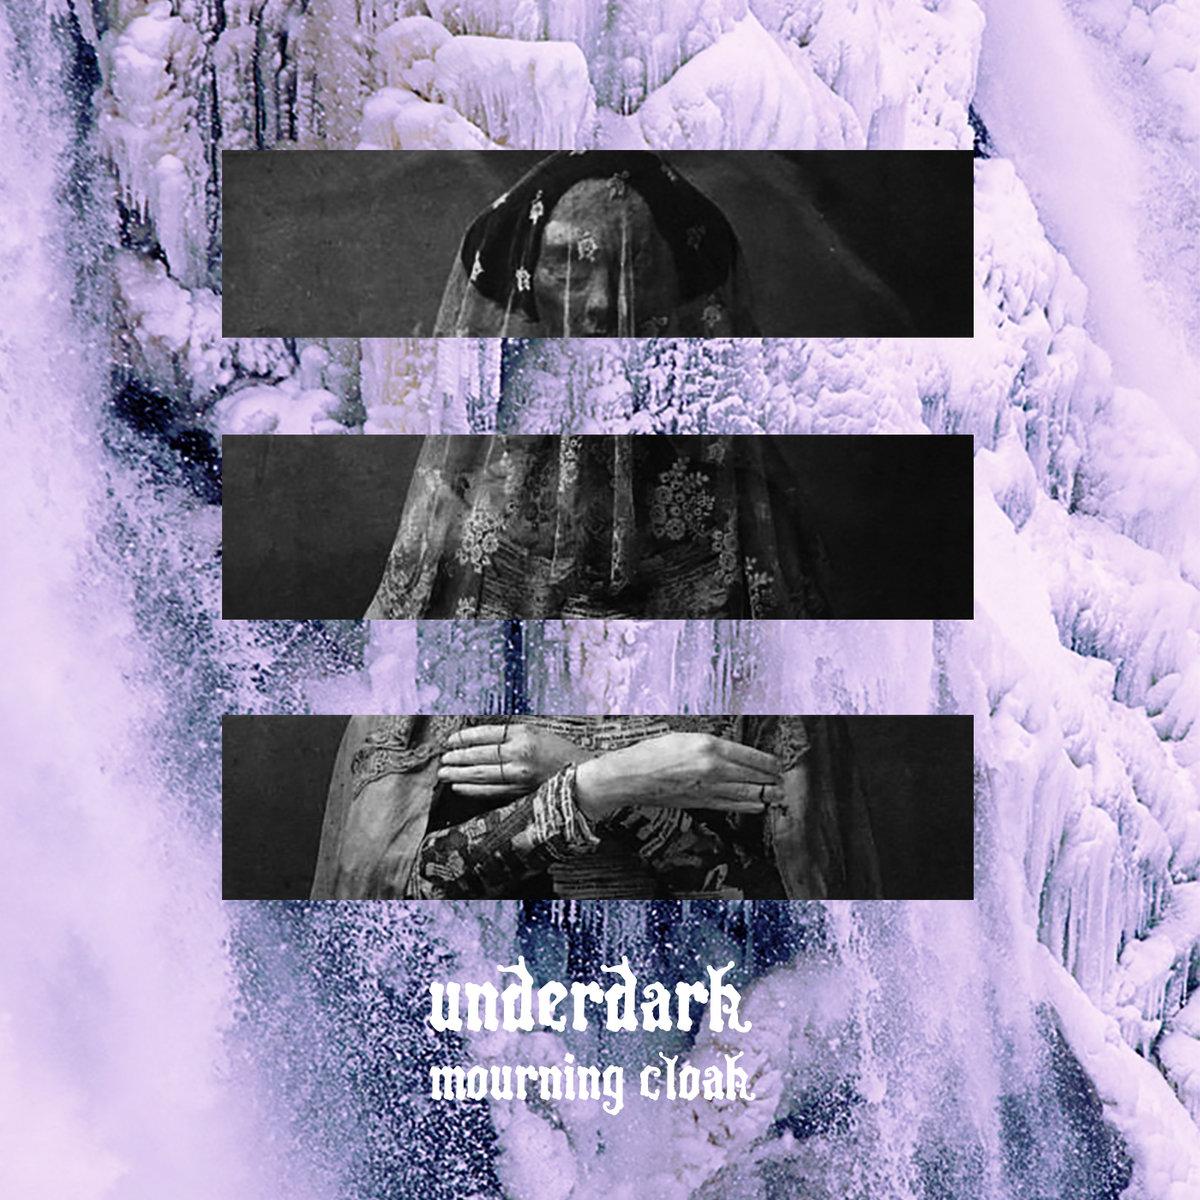 https://underdark.bandcamp.com/album/mourning-cloak